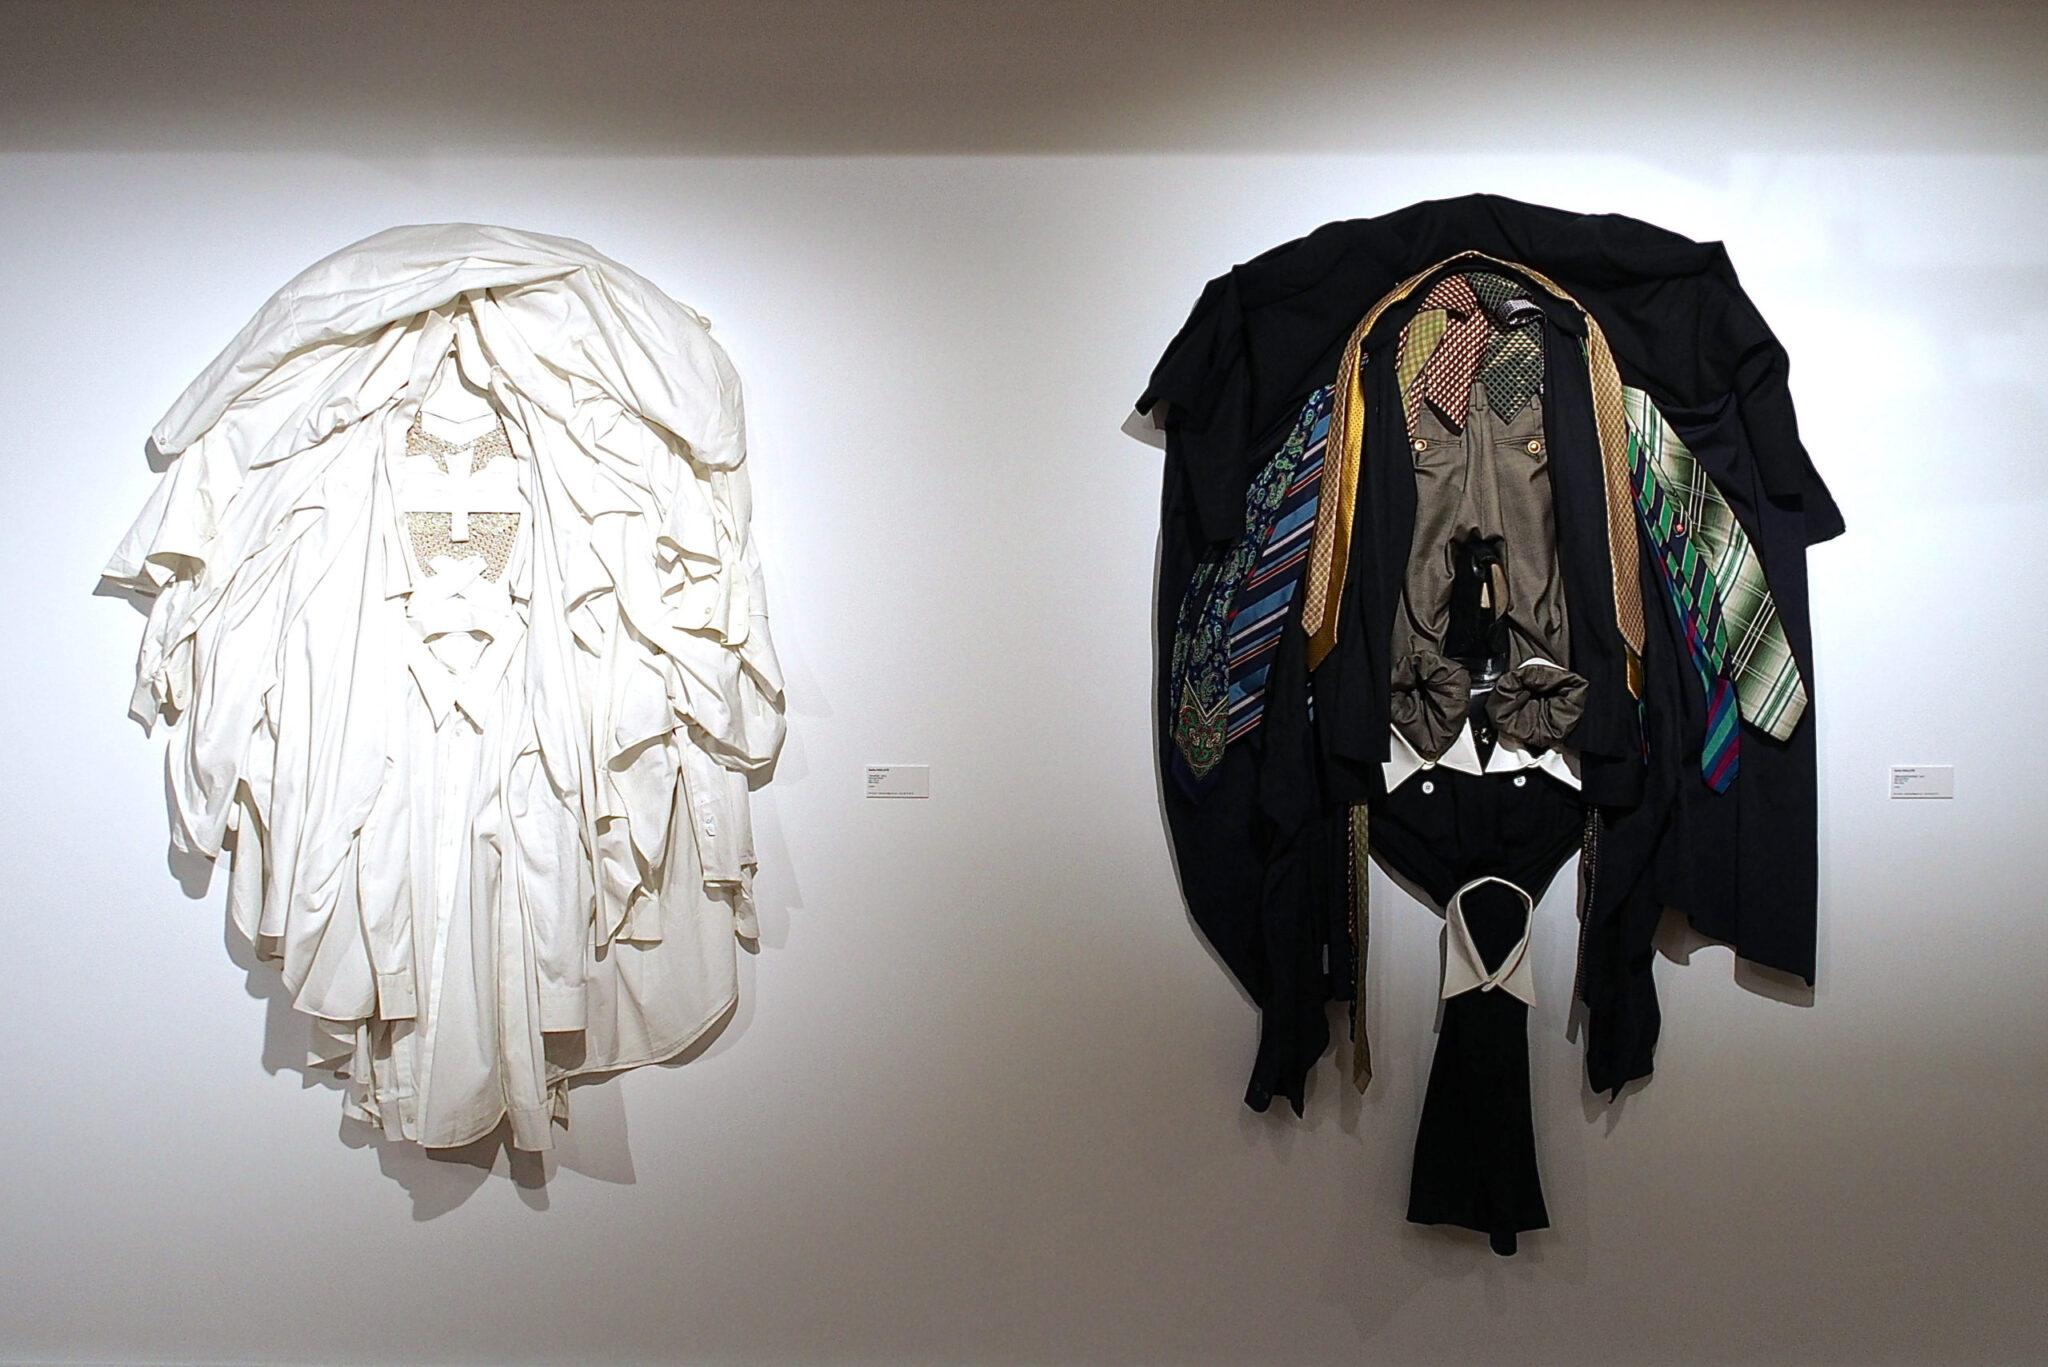 audrey-hatchikian-gallery-flagrant-délire-sacha-haillote-rodolphe-barsikian-expo-contemporary-art-4